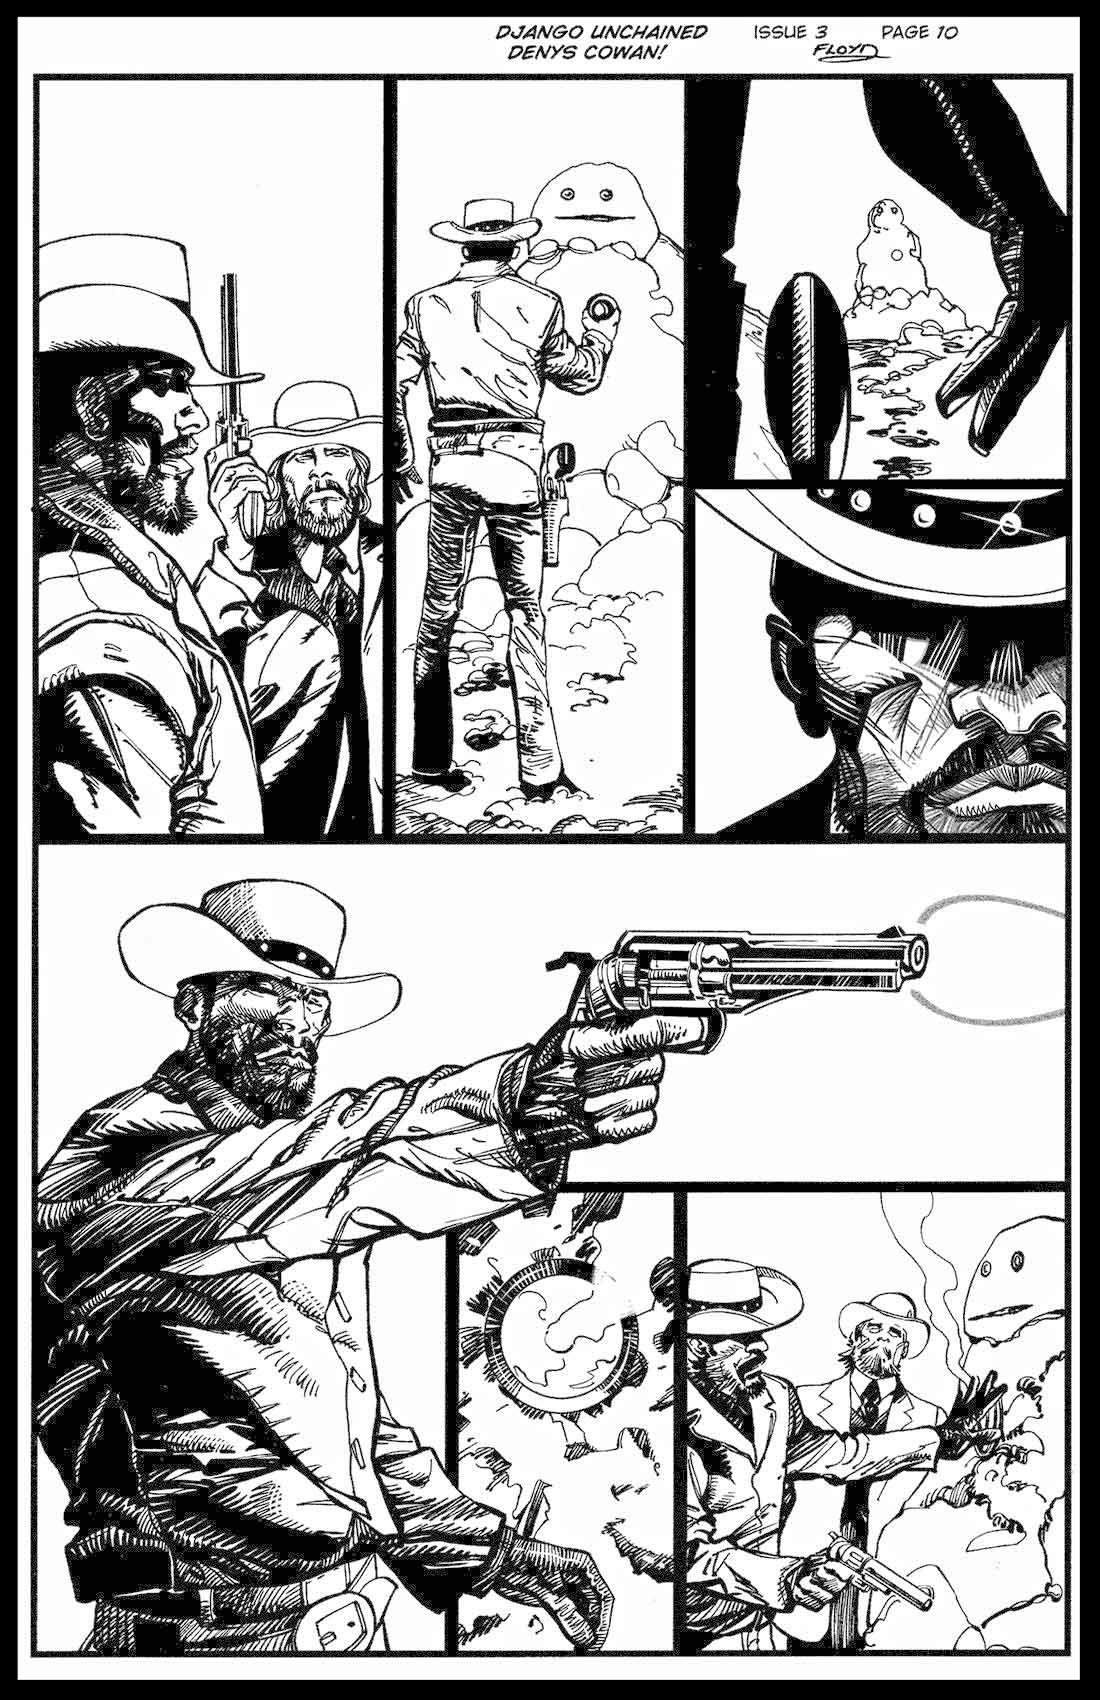 Django Unchained #3 - Page 10 - Pencils & Inks